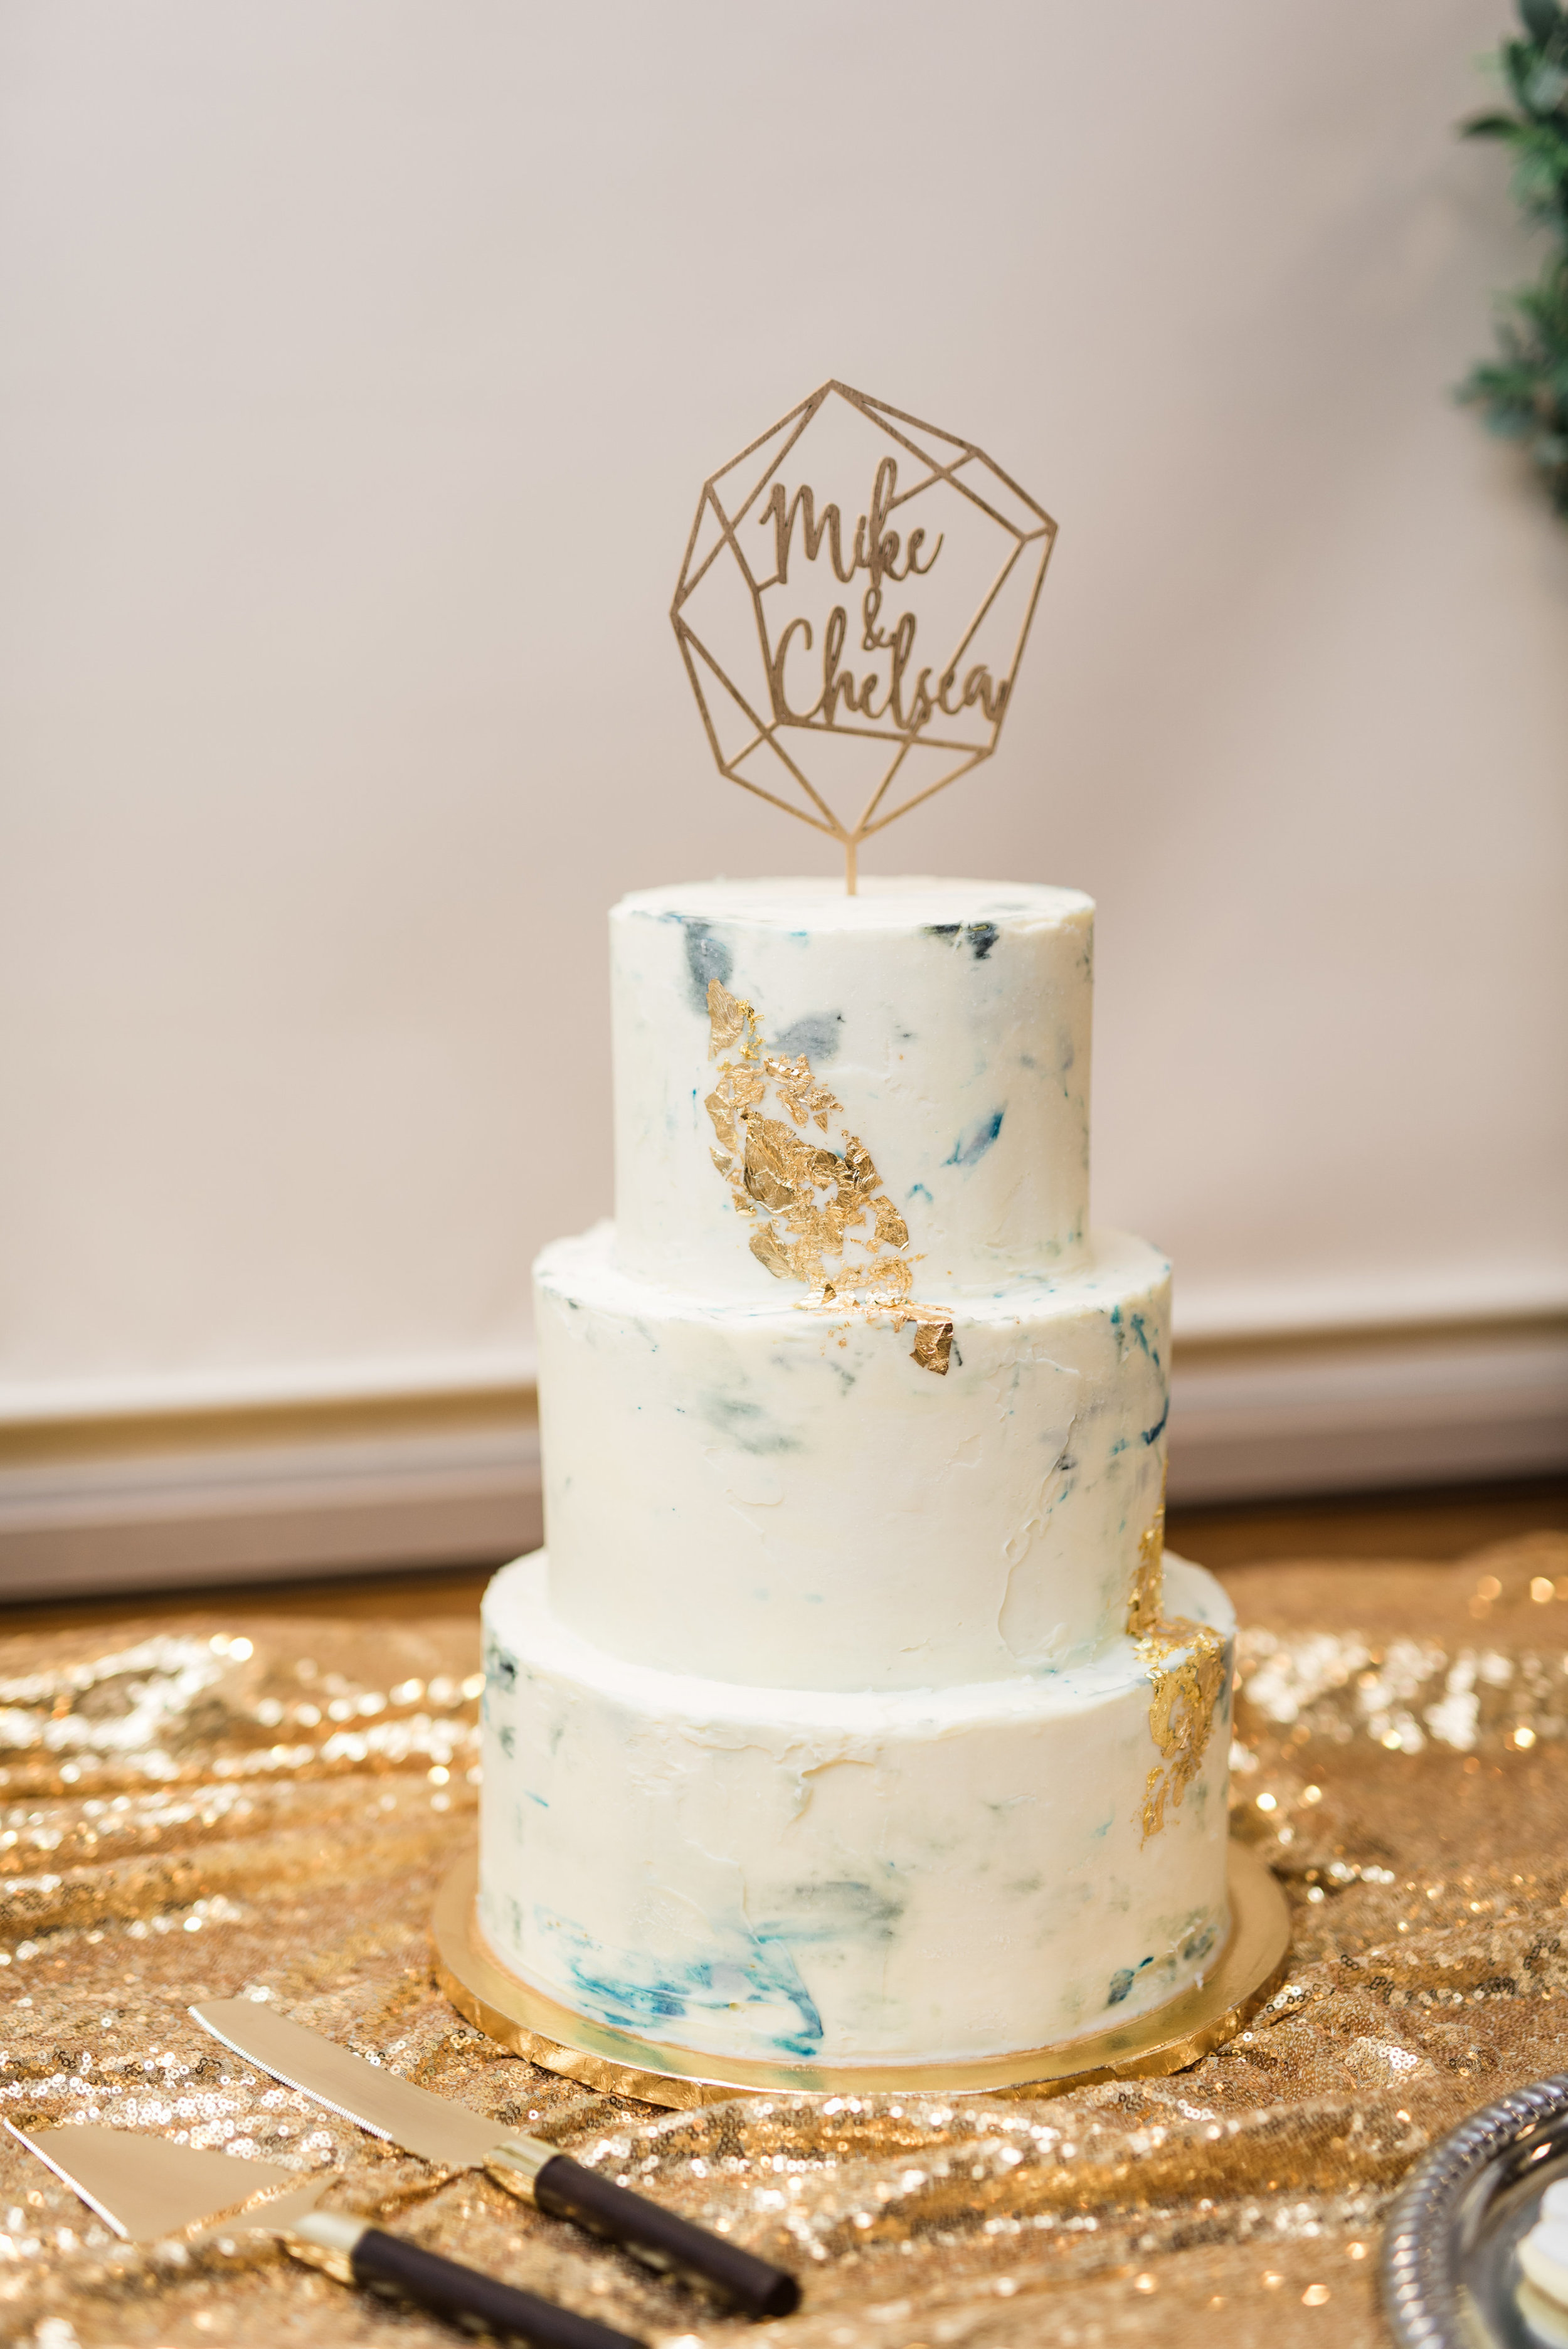 Boho Sedona Wedding - White and gold cake with geometric topper